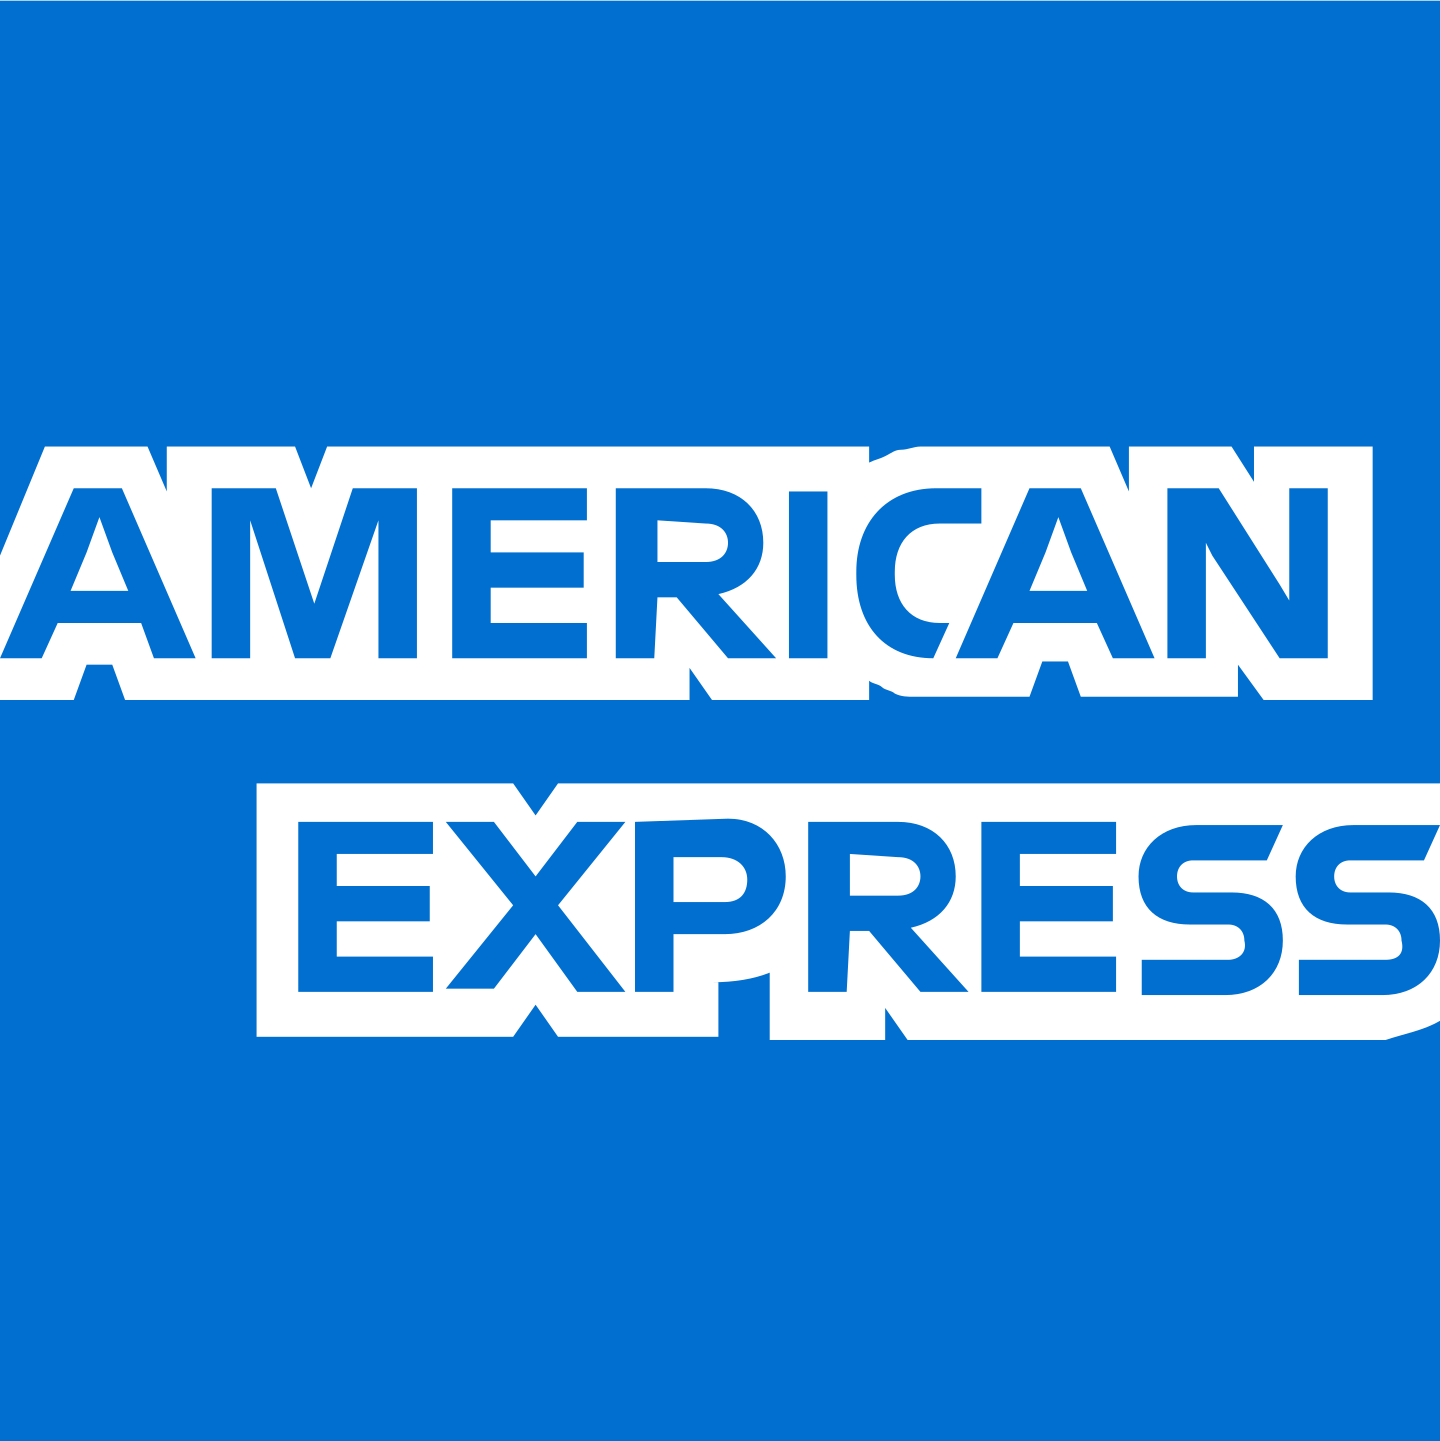 amex american express logo 2 - American Express Logo